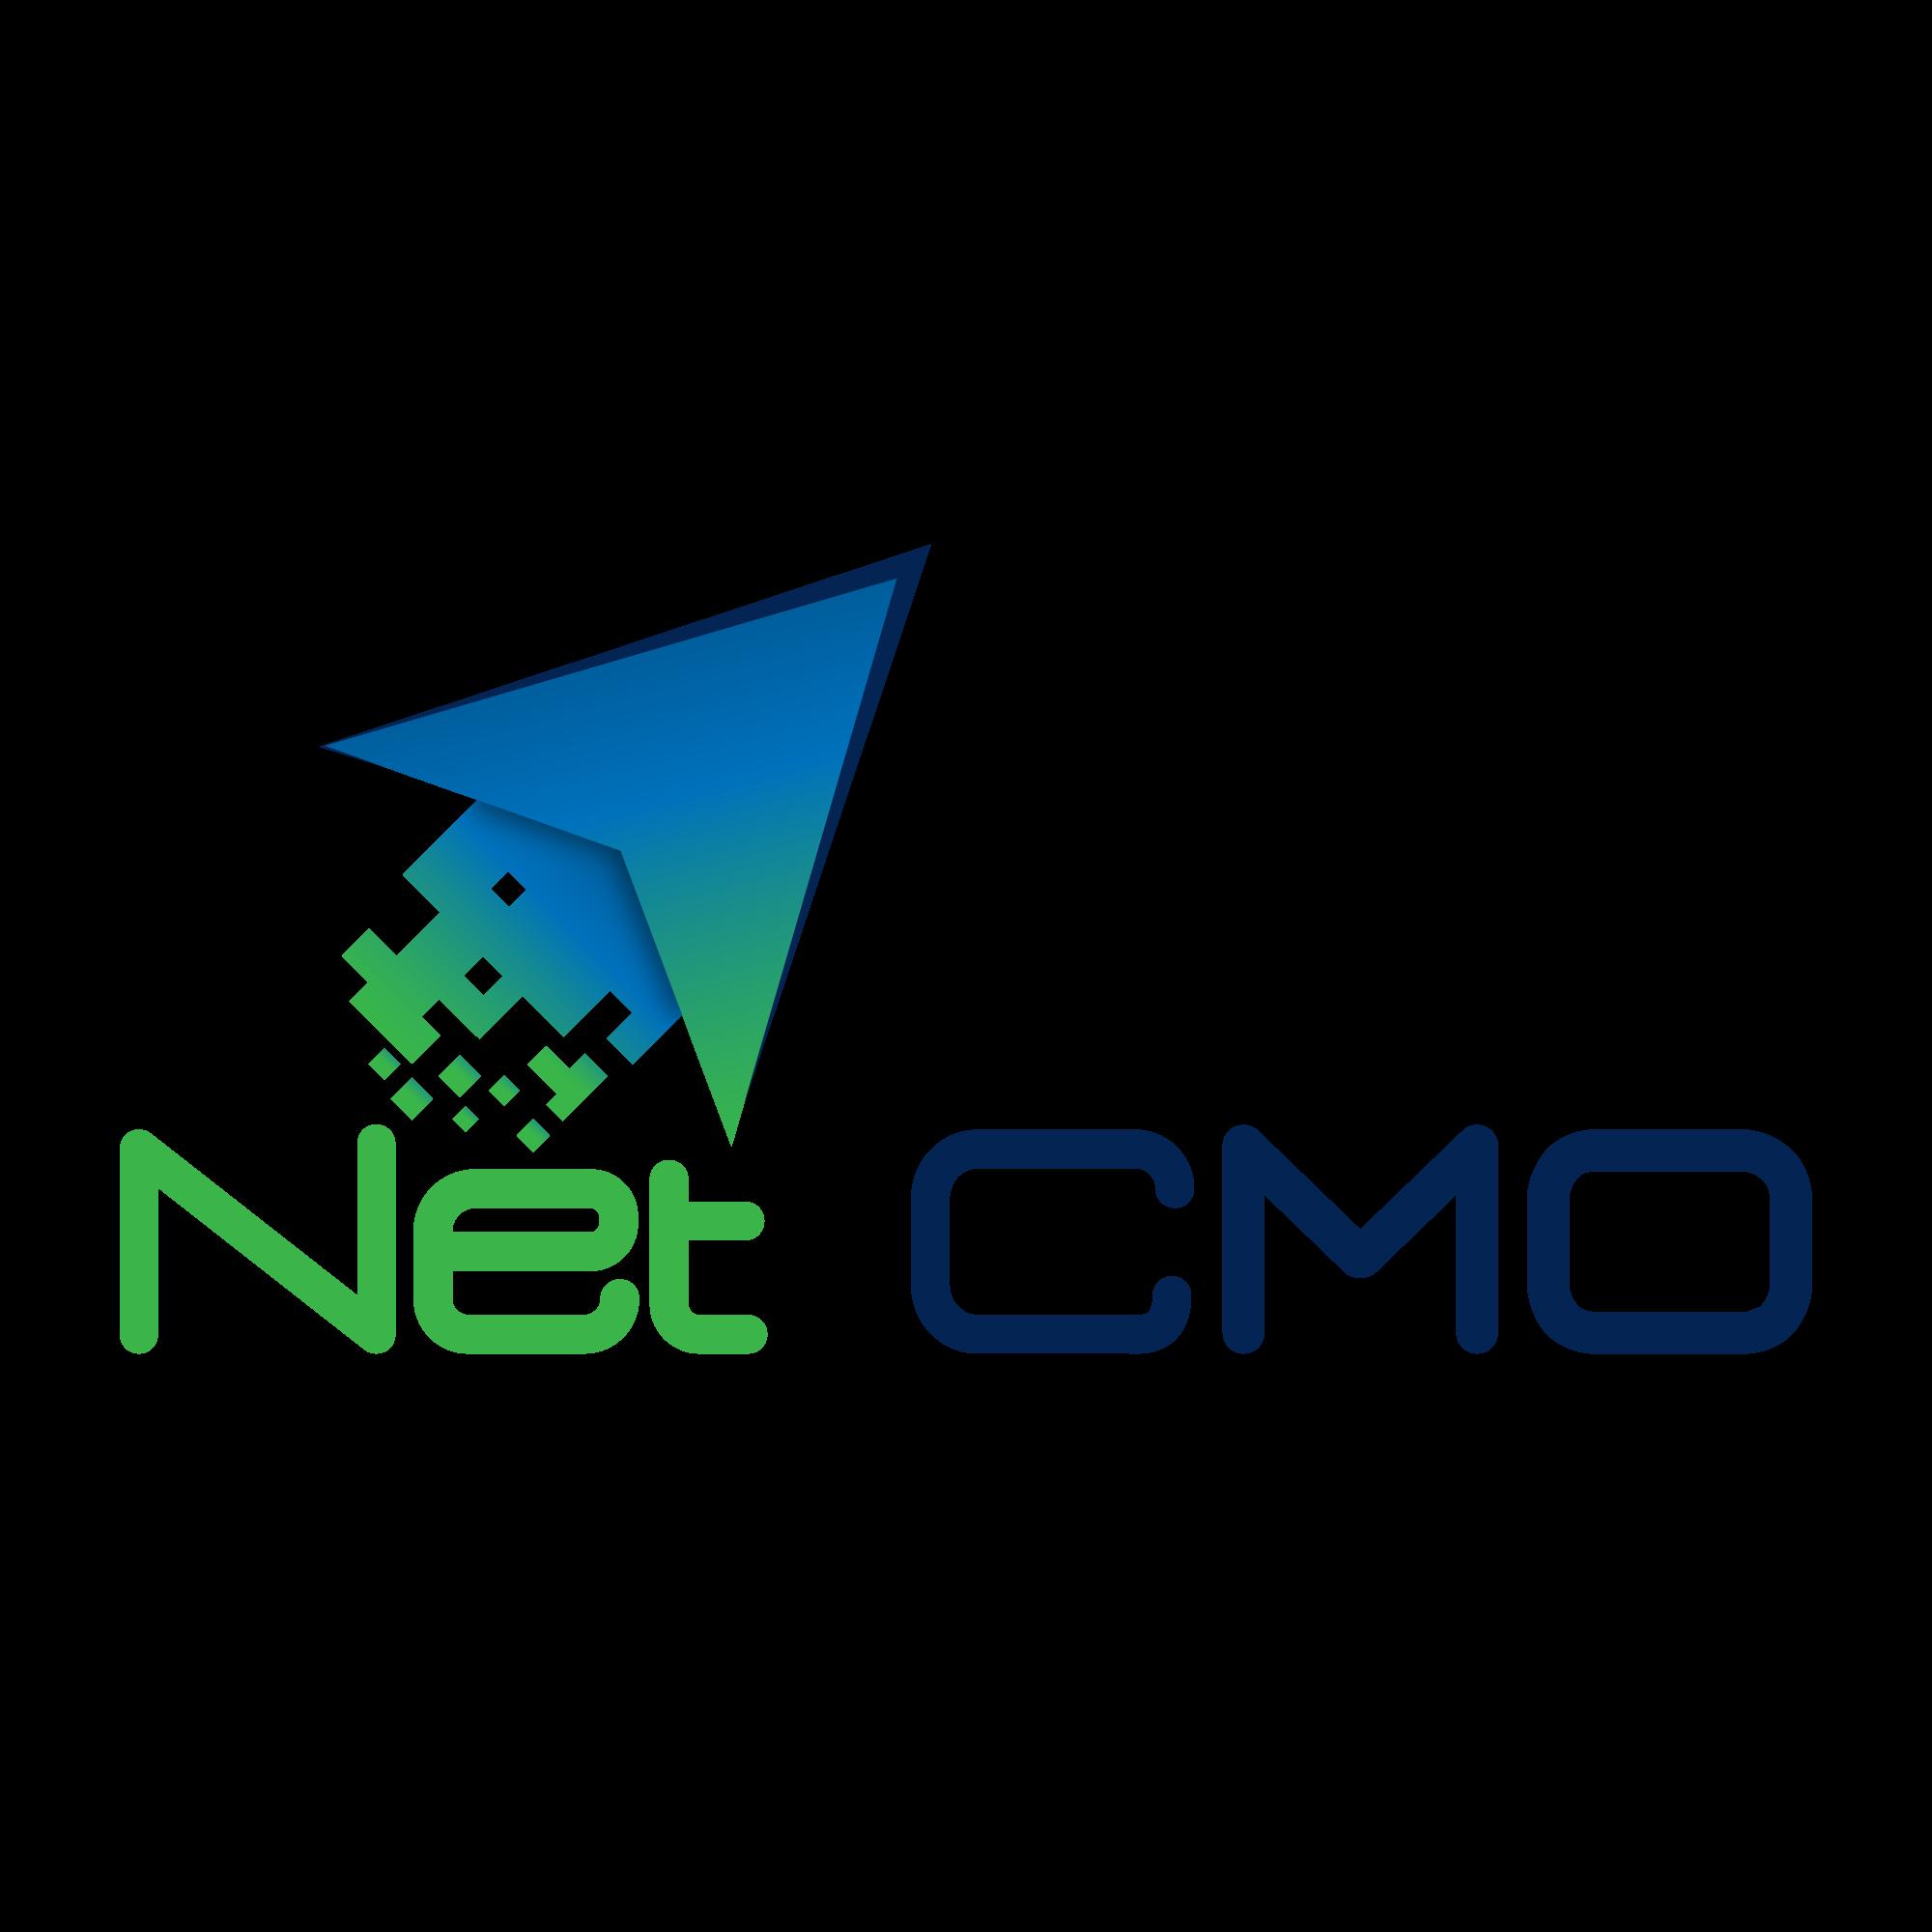 Net CMO, LLC